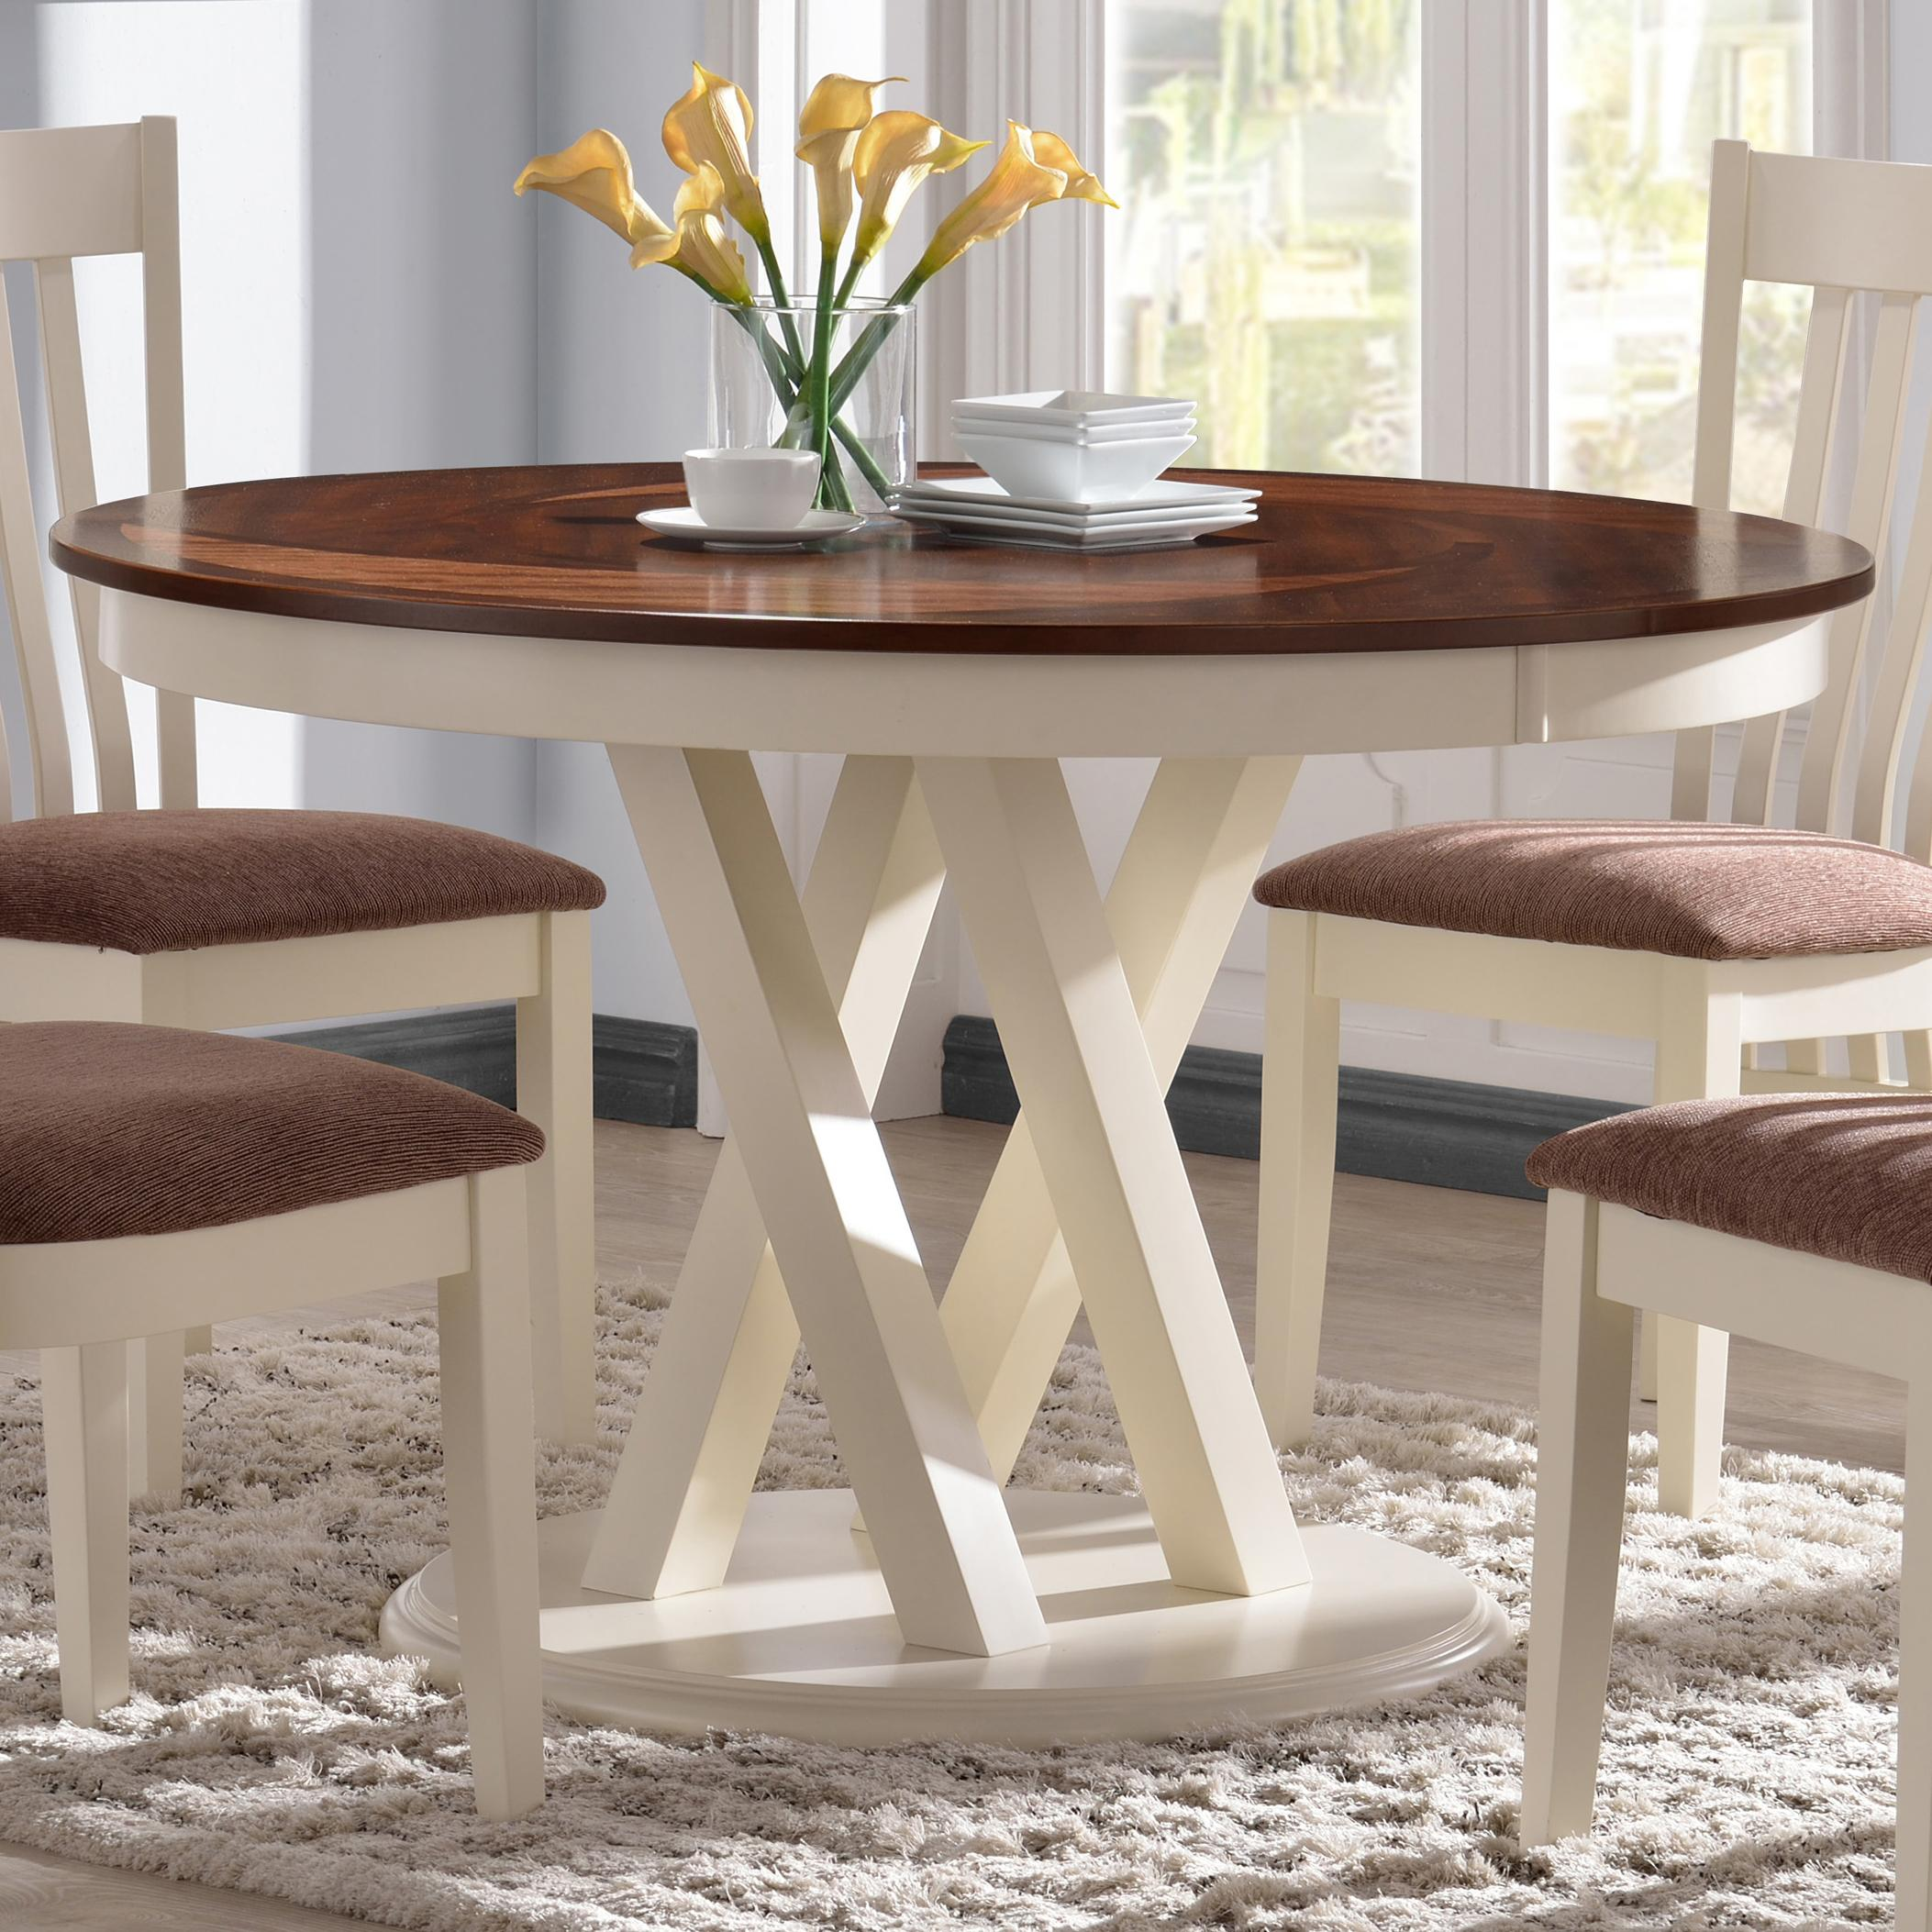 Matteo Kitchens: Fine Furniture Naomi 10434 104341 Round Kitchen Table With